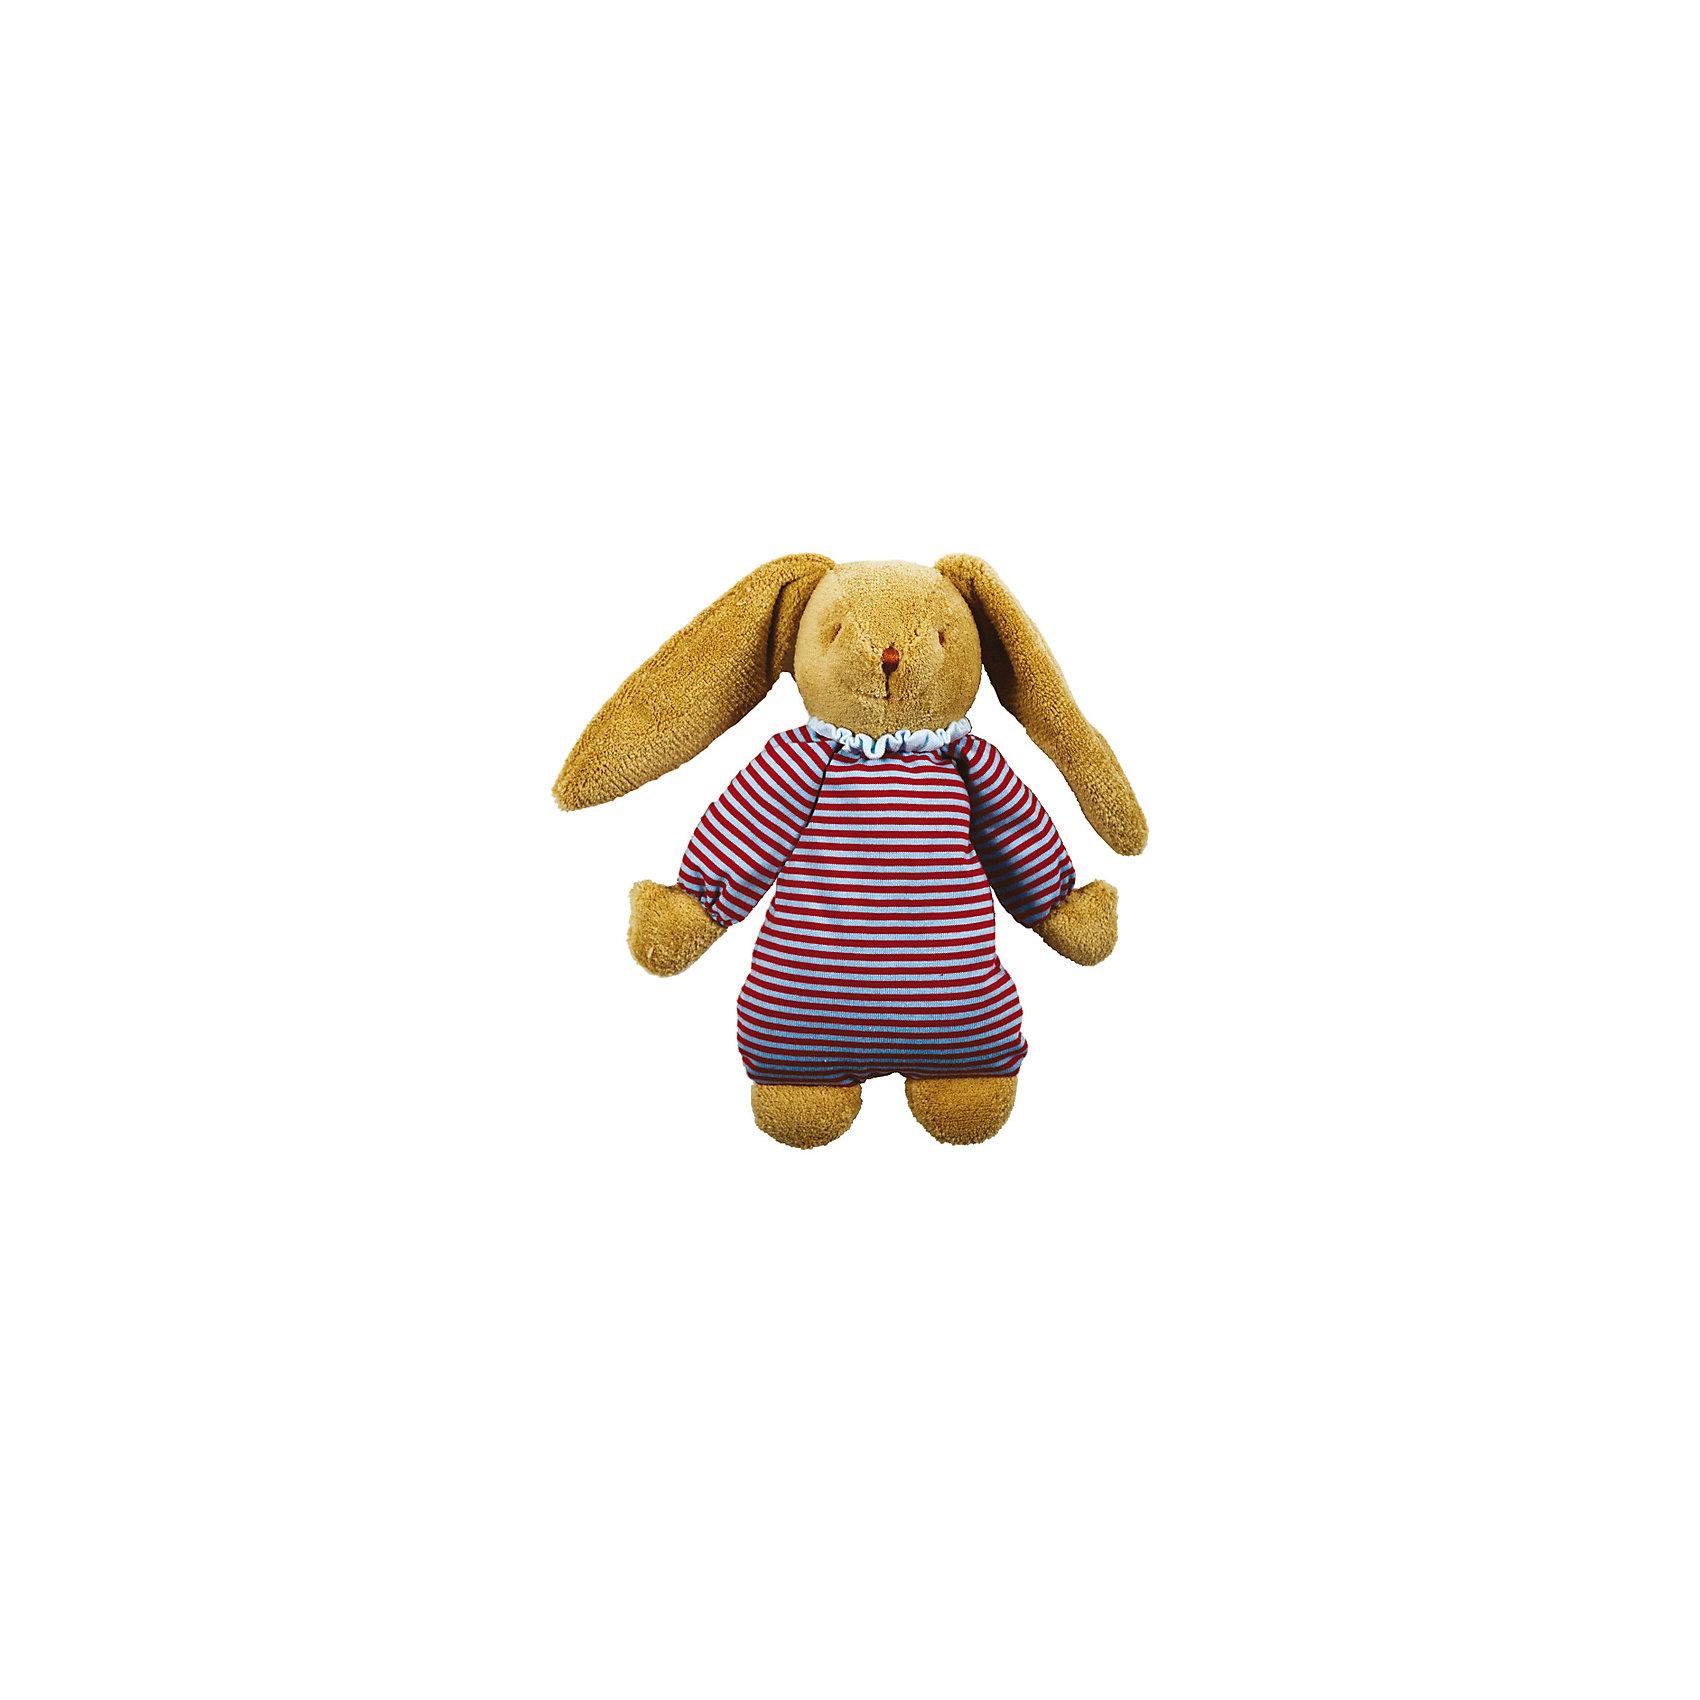 TROUSSELIER Мягкая игрушка Зайка с музыкой, в полоску, 25см, Trousselier trousselier мягкая игрушка зайка с музыкой розовый 25см trousselier